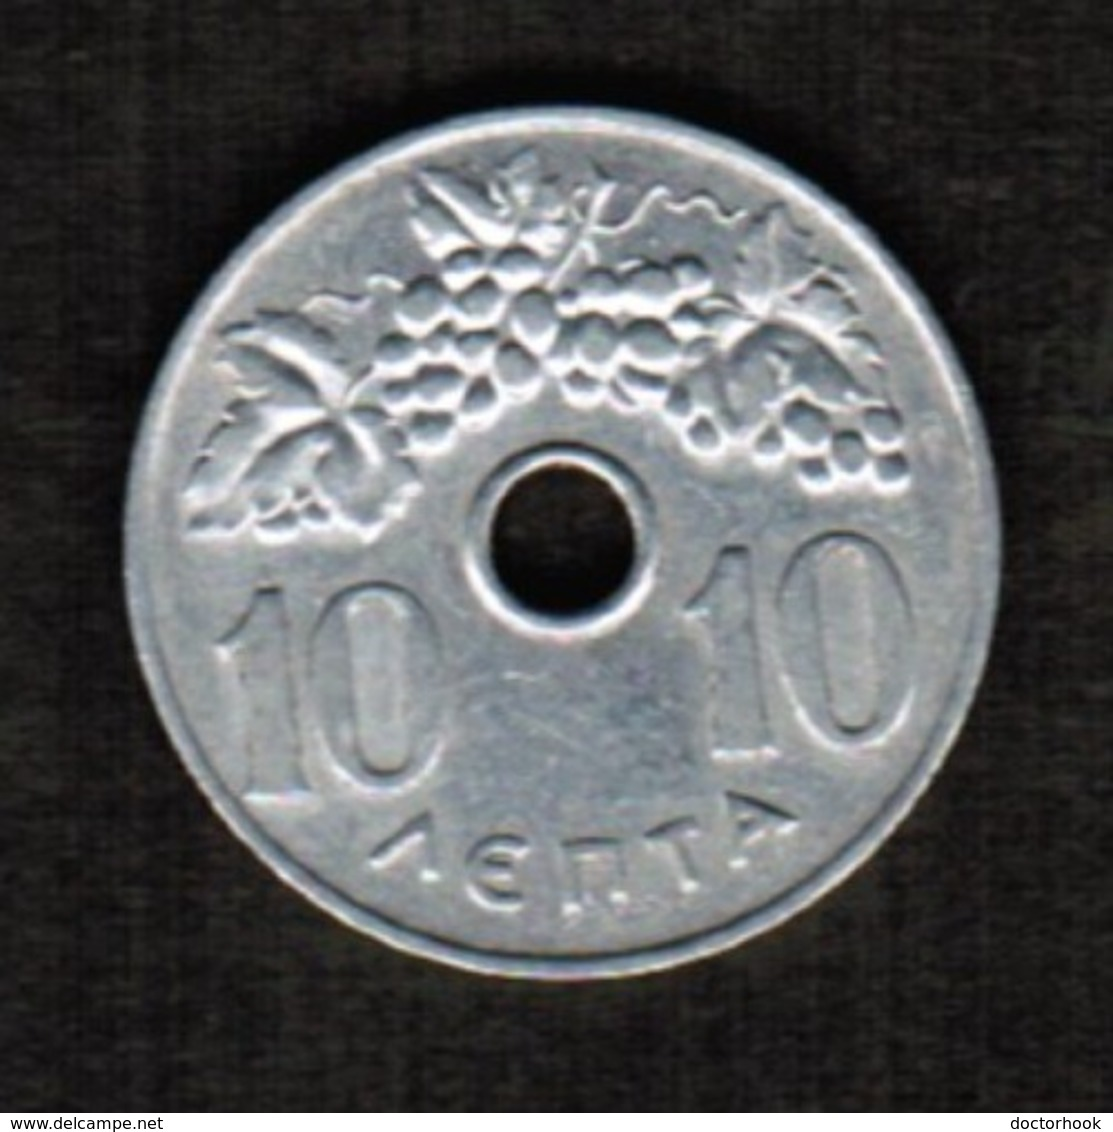 GREECE  10 LEPTA 1966 (KM # 78) #5310 - Griechenland